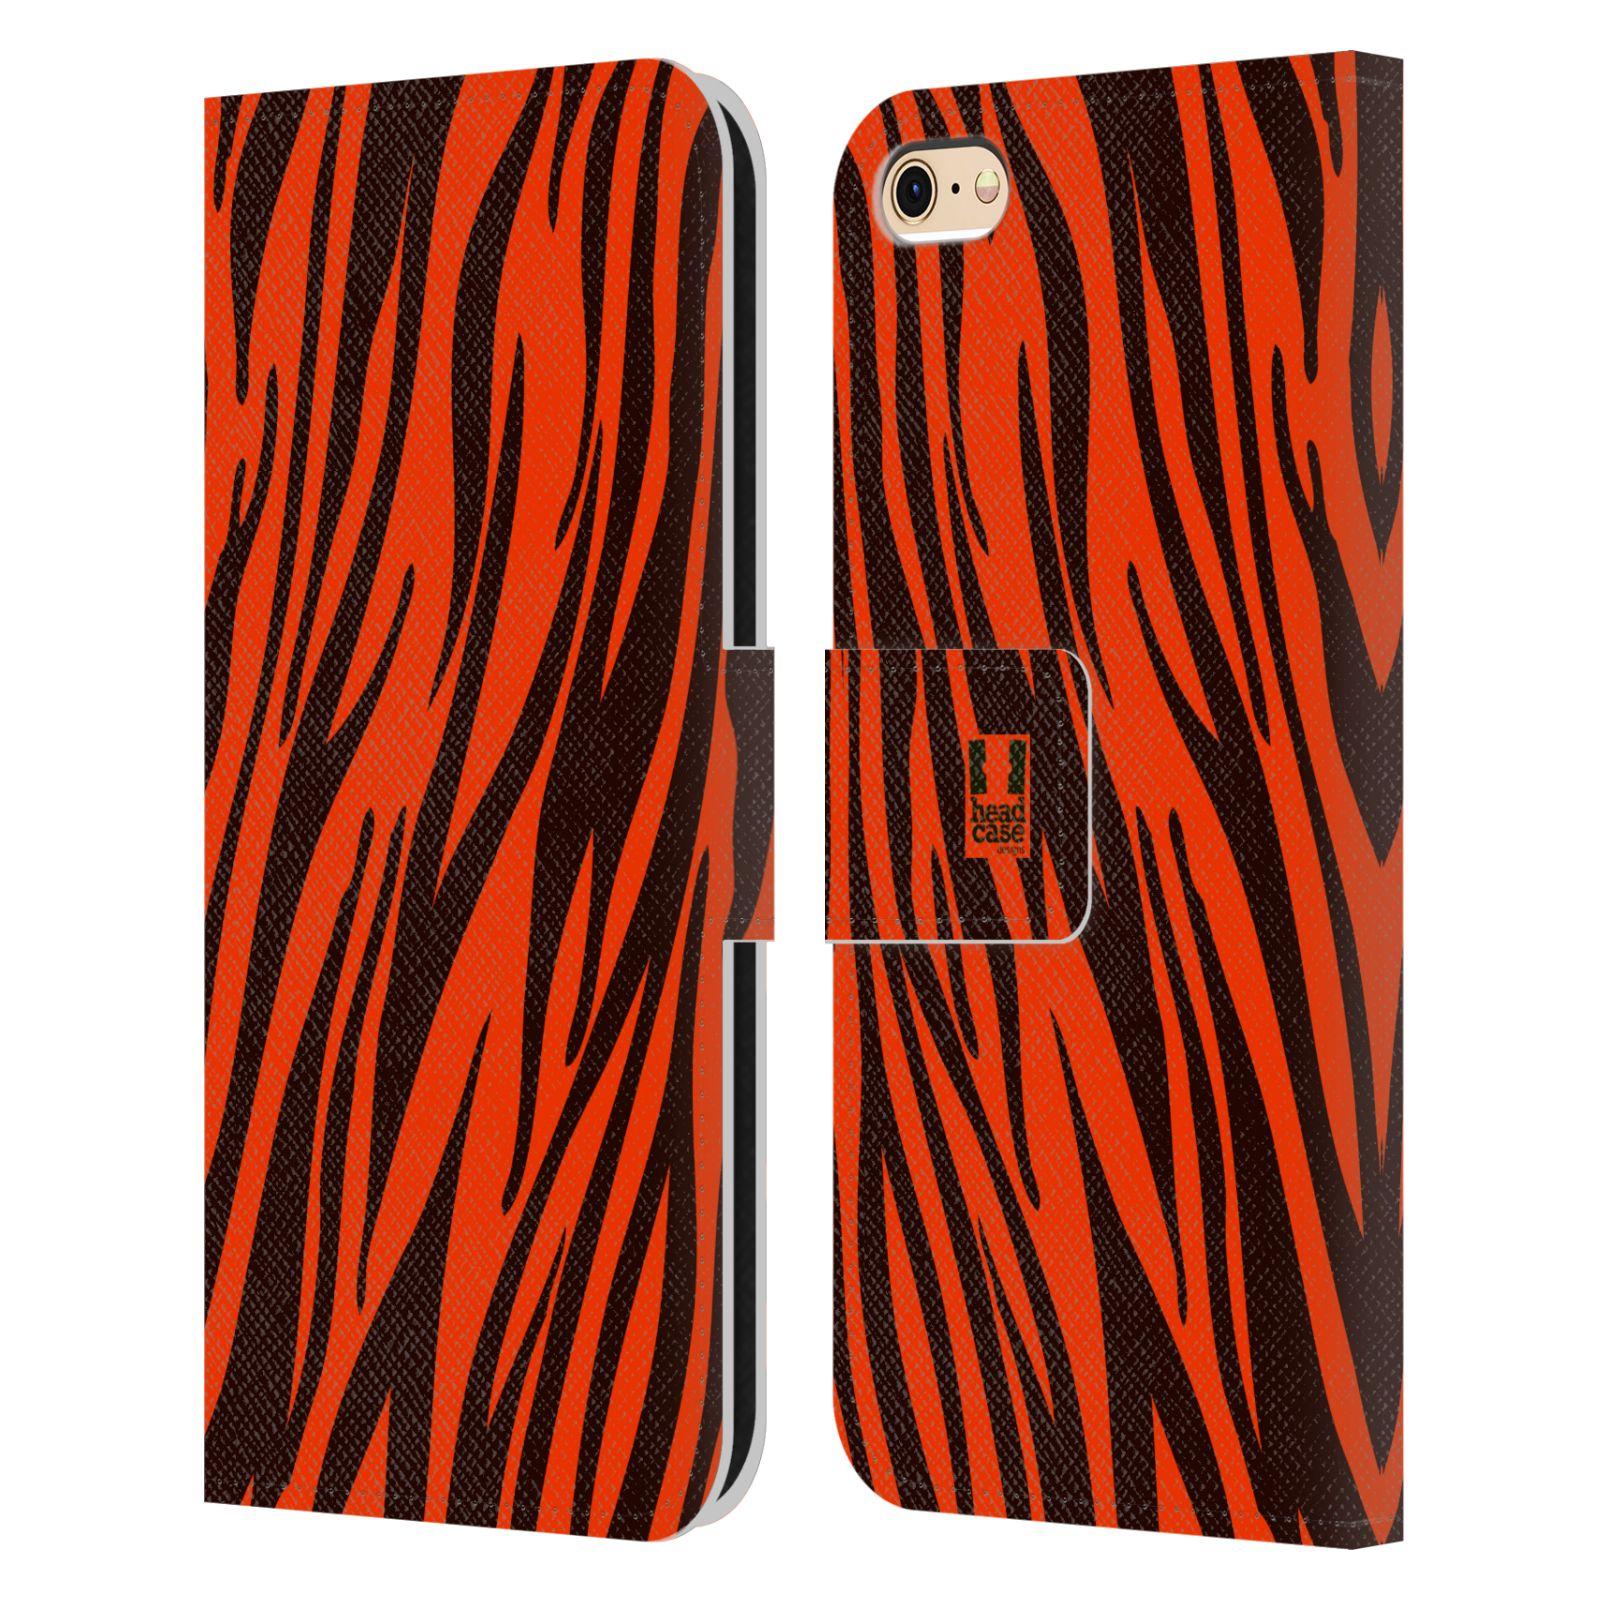 HEAD CASE Flipové pouzdro pro mobil Apple Iphone 6/6s Zvířecí barevné vzory oranžový tygr